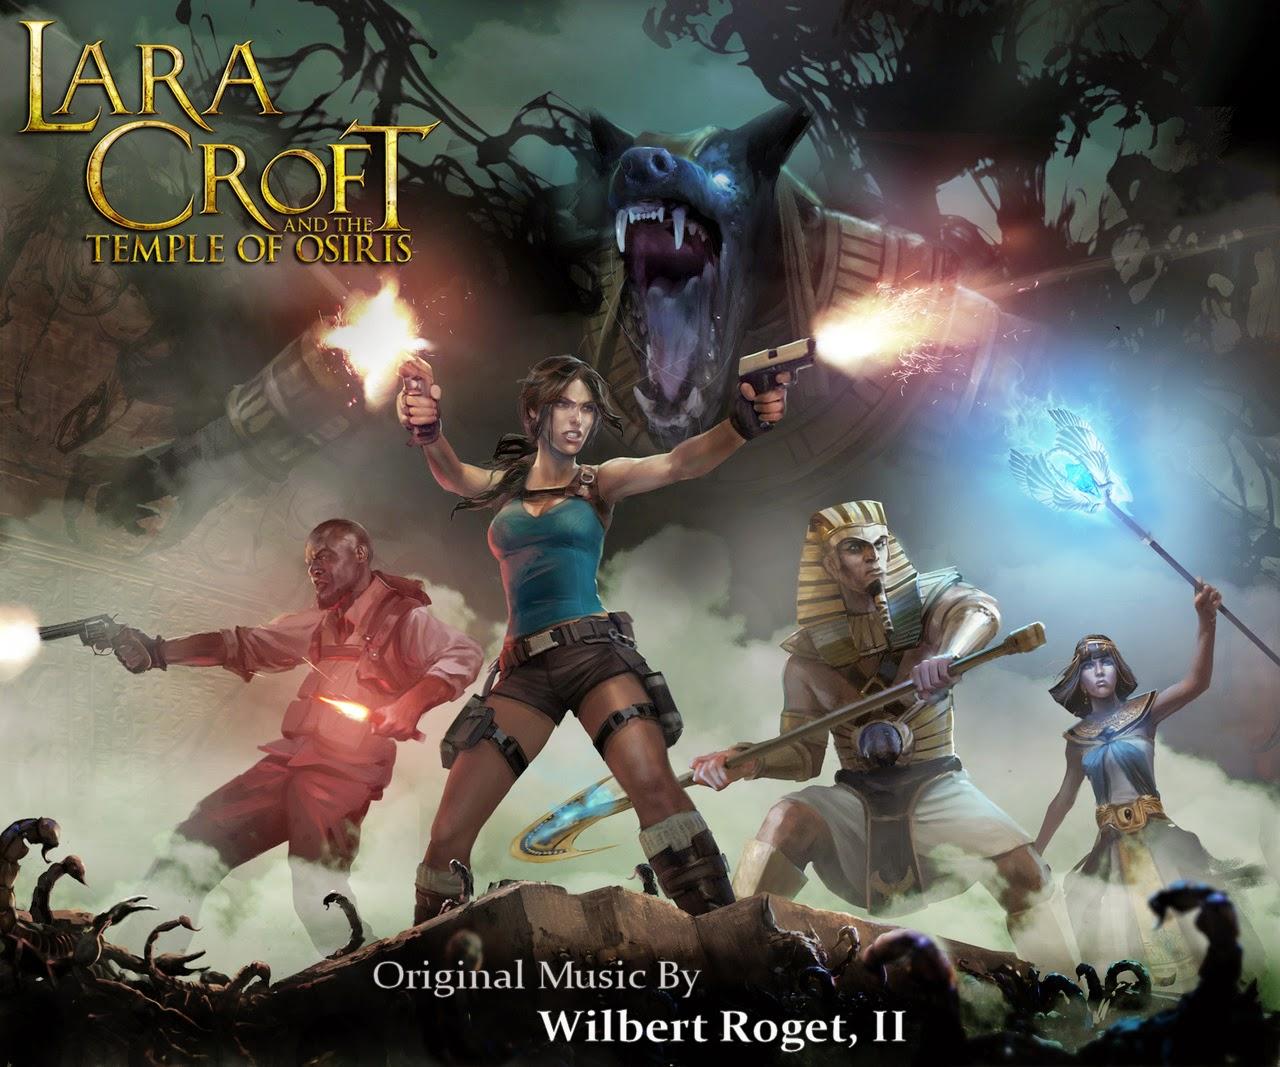 The Music of Tomb Raider: Lara Croft and the Temple of Osiris